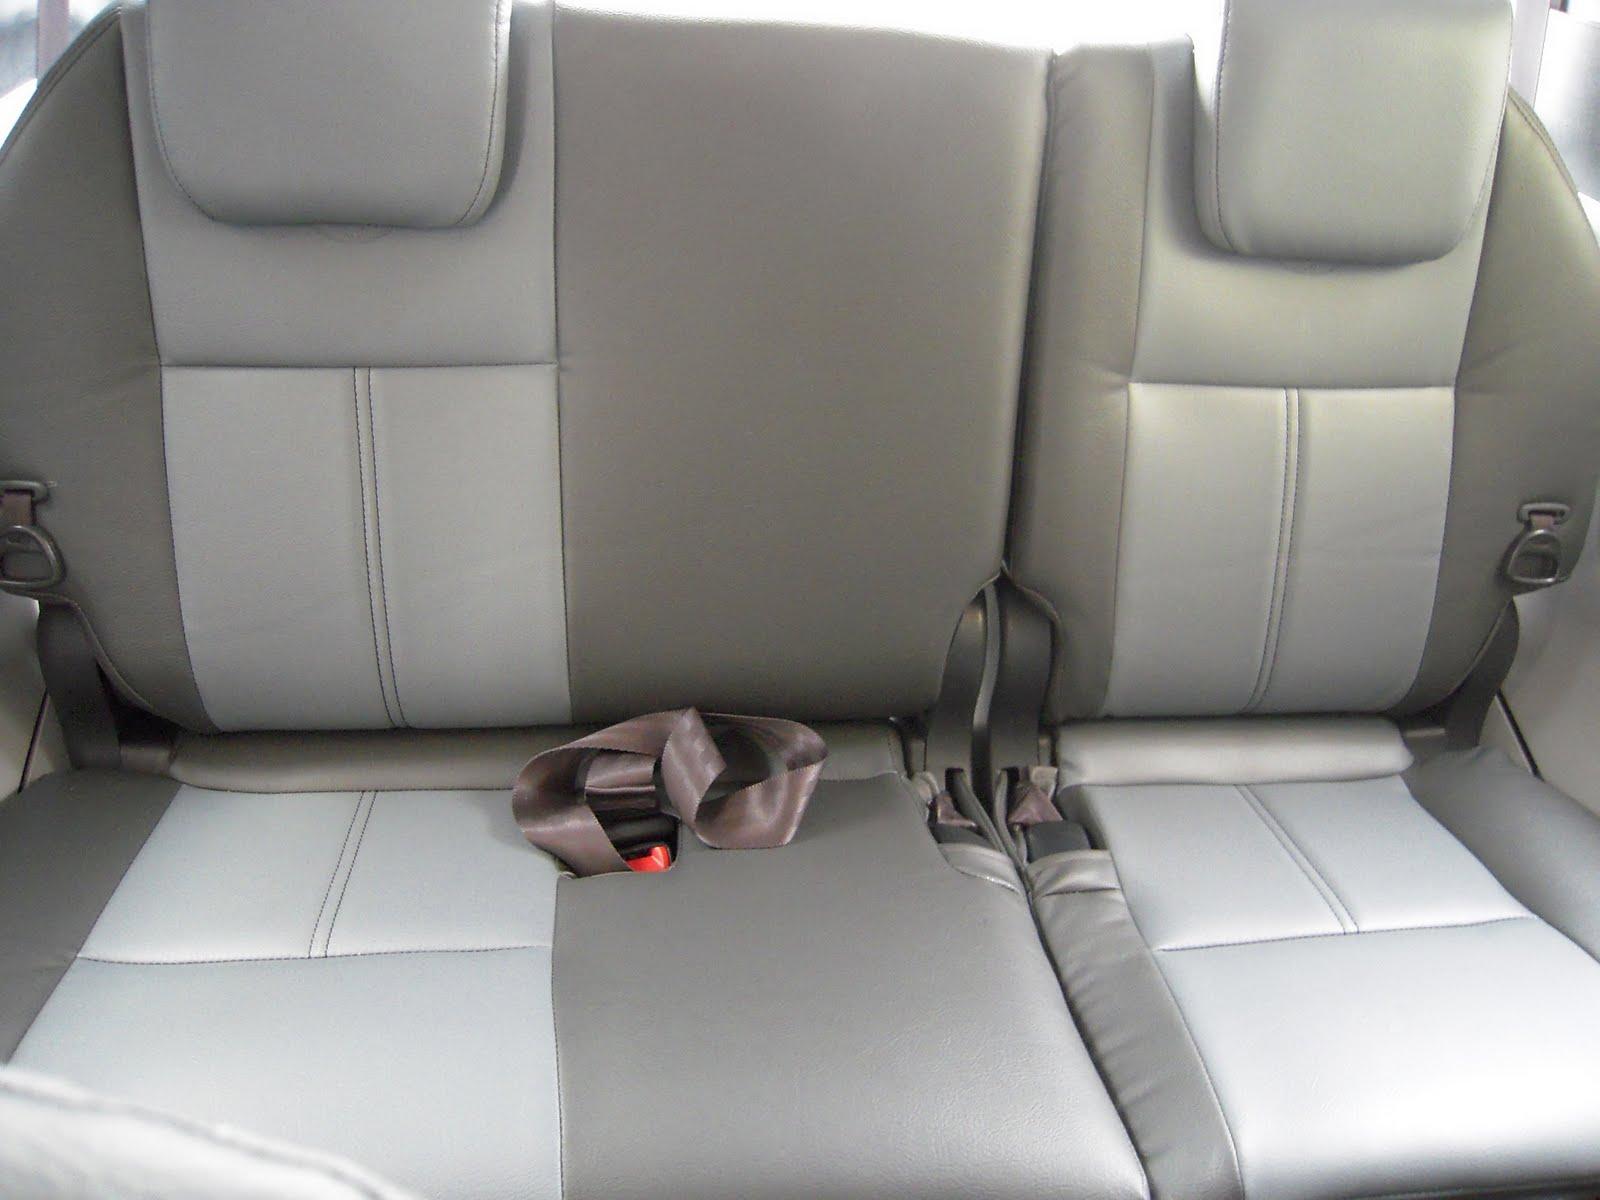 Nissan Near Me >> TCA AUDIO CAR ACCESSORIES: TOYOTA ESTIMA 07 SEAT COVER